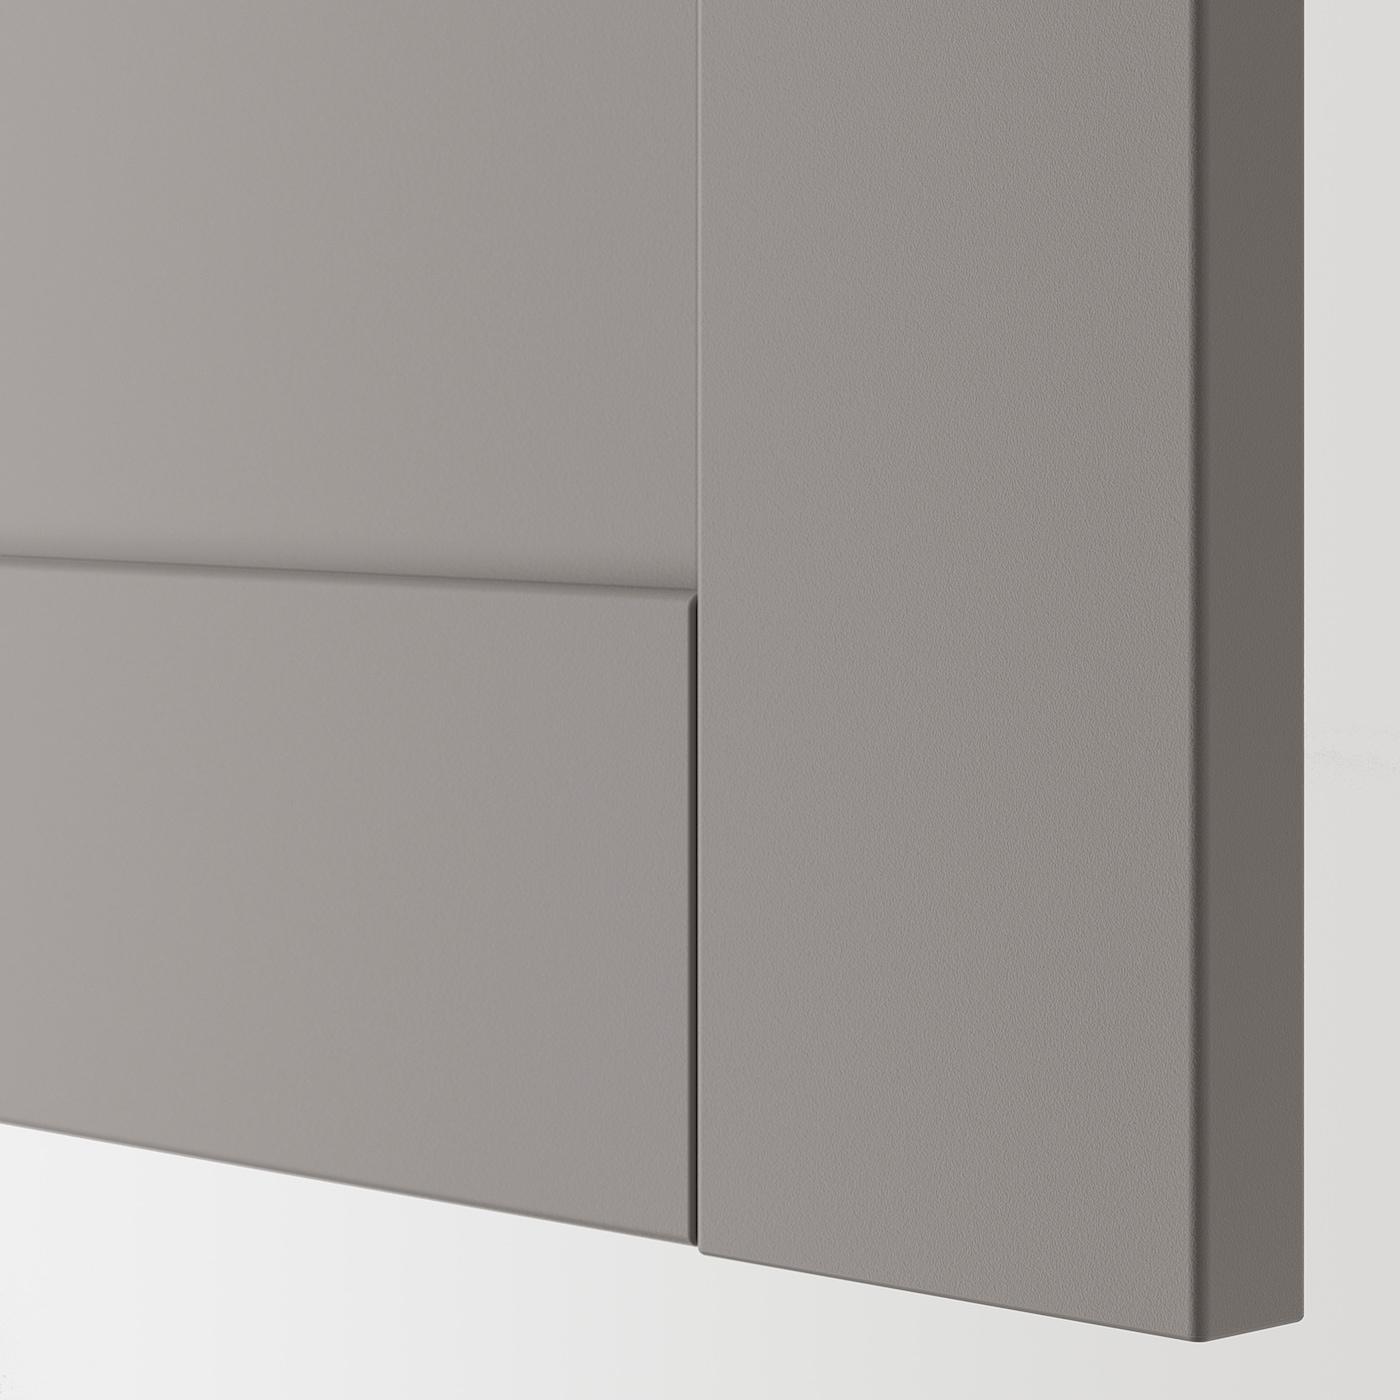 ENHET Bc w shlf/doors, white/grey frame, 80x62x75 cm